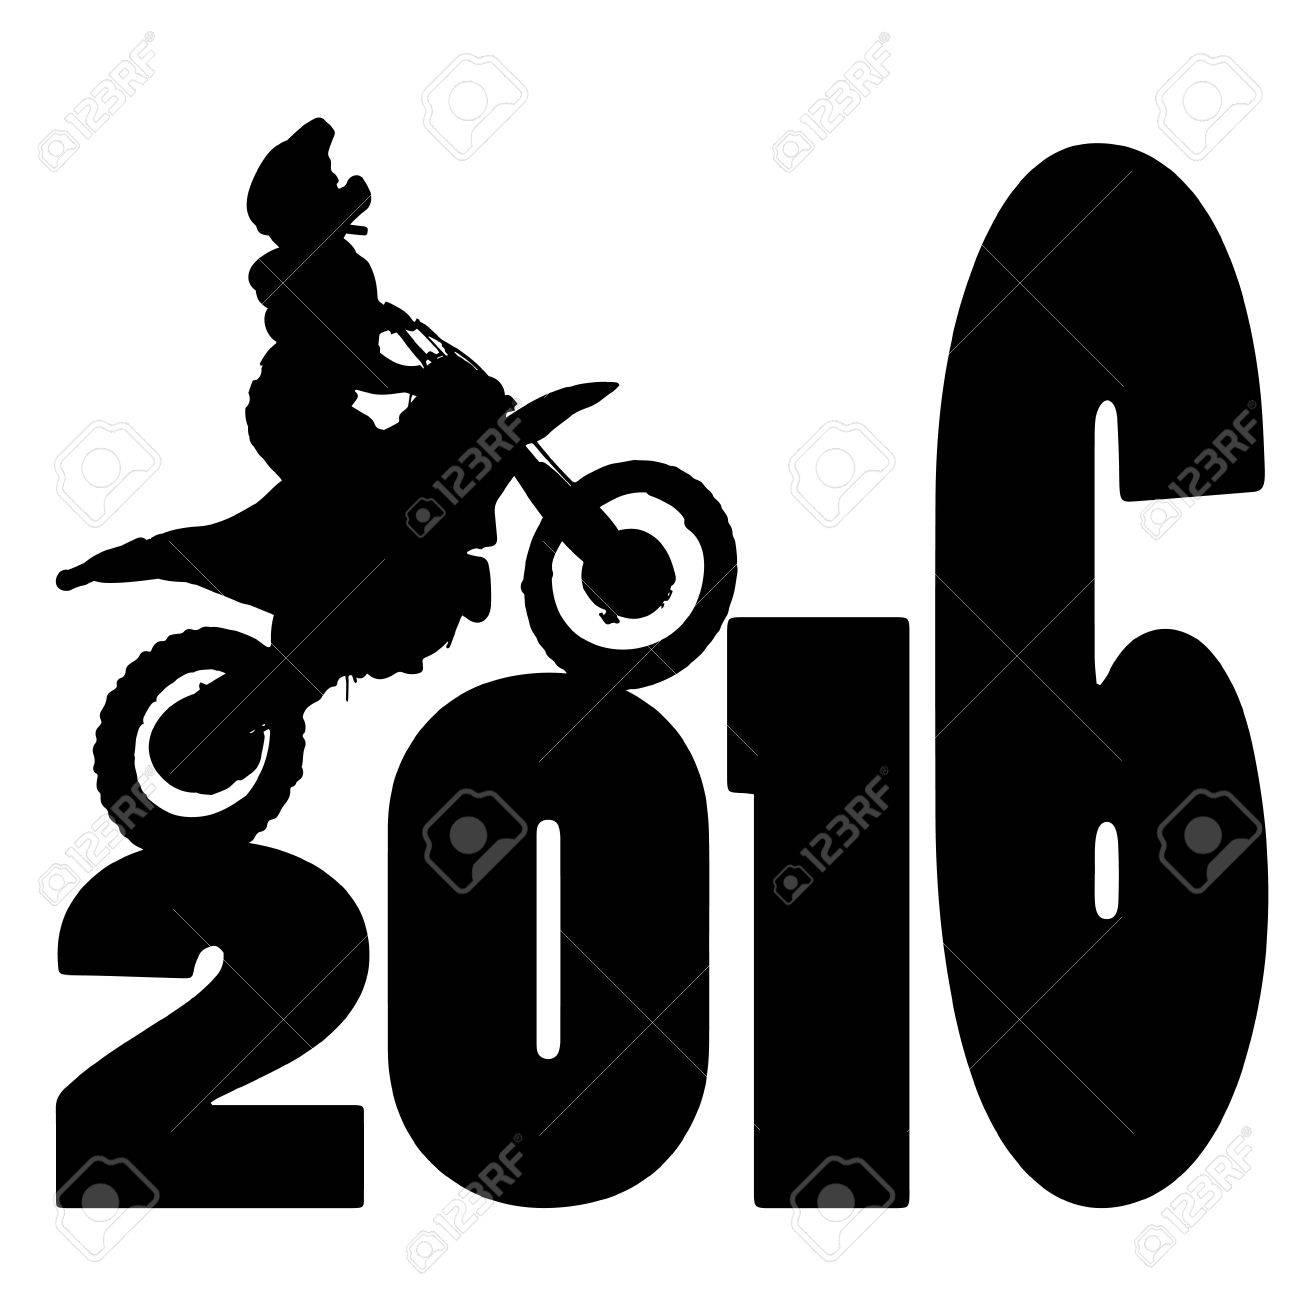 black silhouette vector illustration 2016 New Year - 46232036